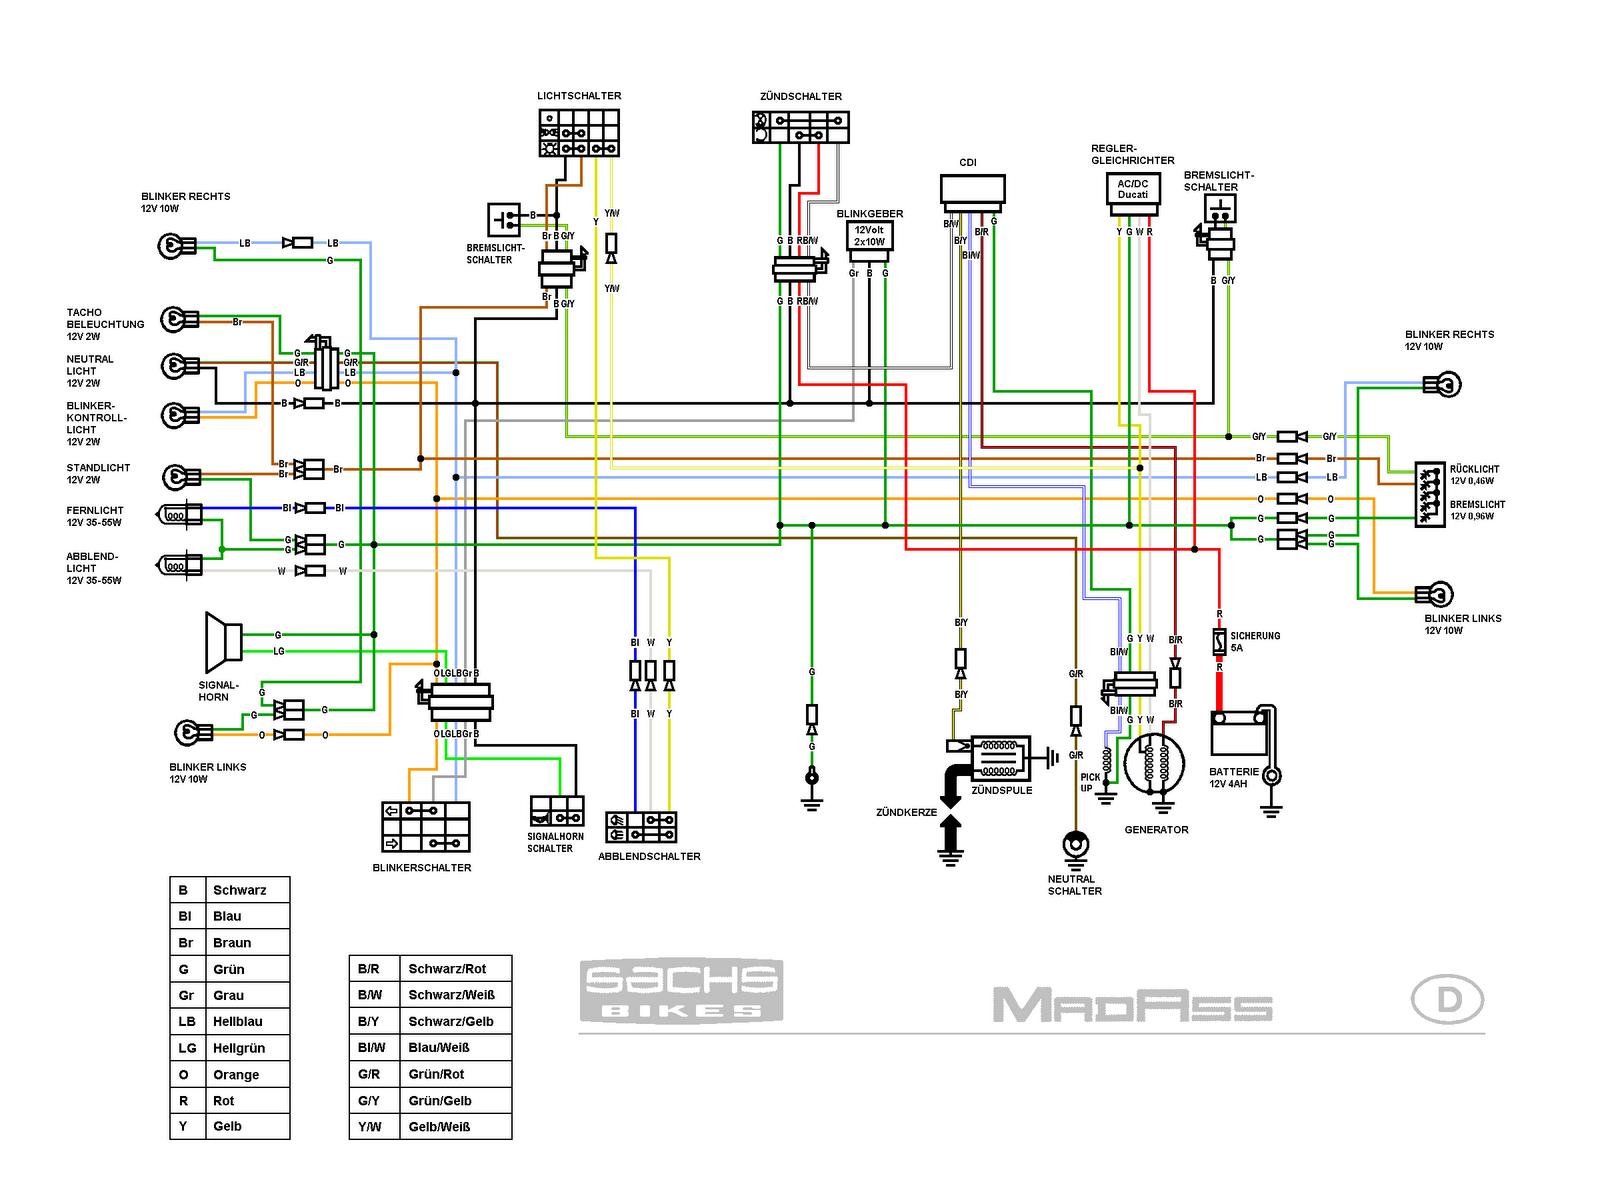 Manualguide Eaton 9130 Wiring Diagram Sachs Xtc 125 Service Manual Free Download Herunterladen Kostenlos Rh Timothyburkhart Com